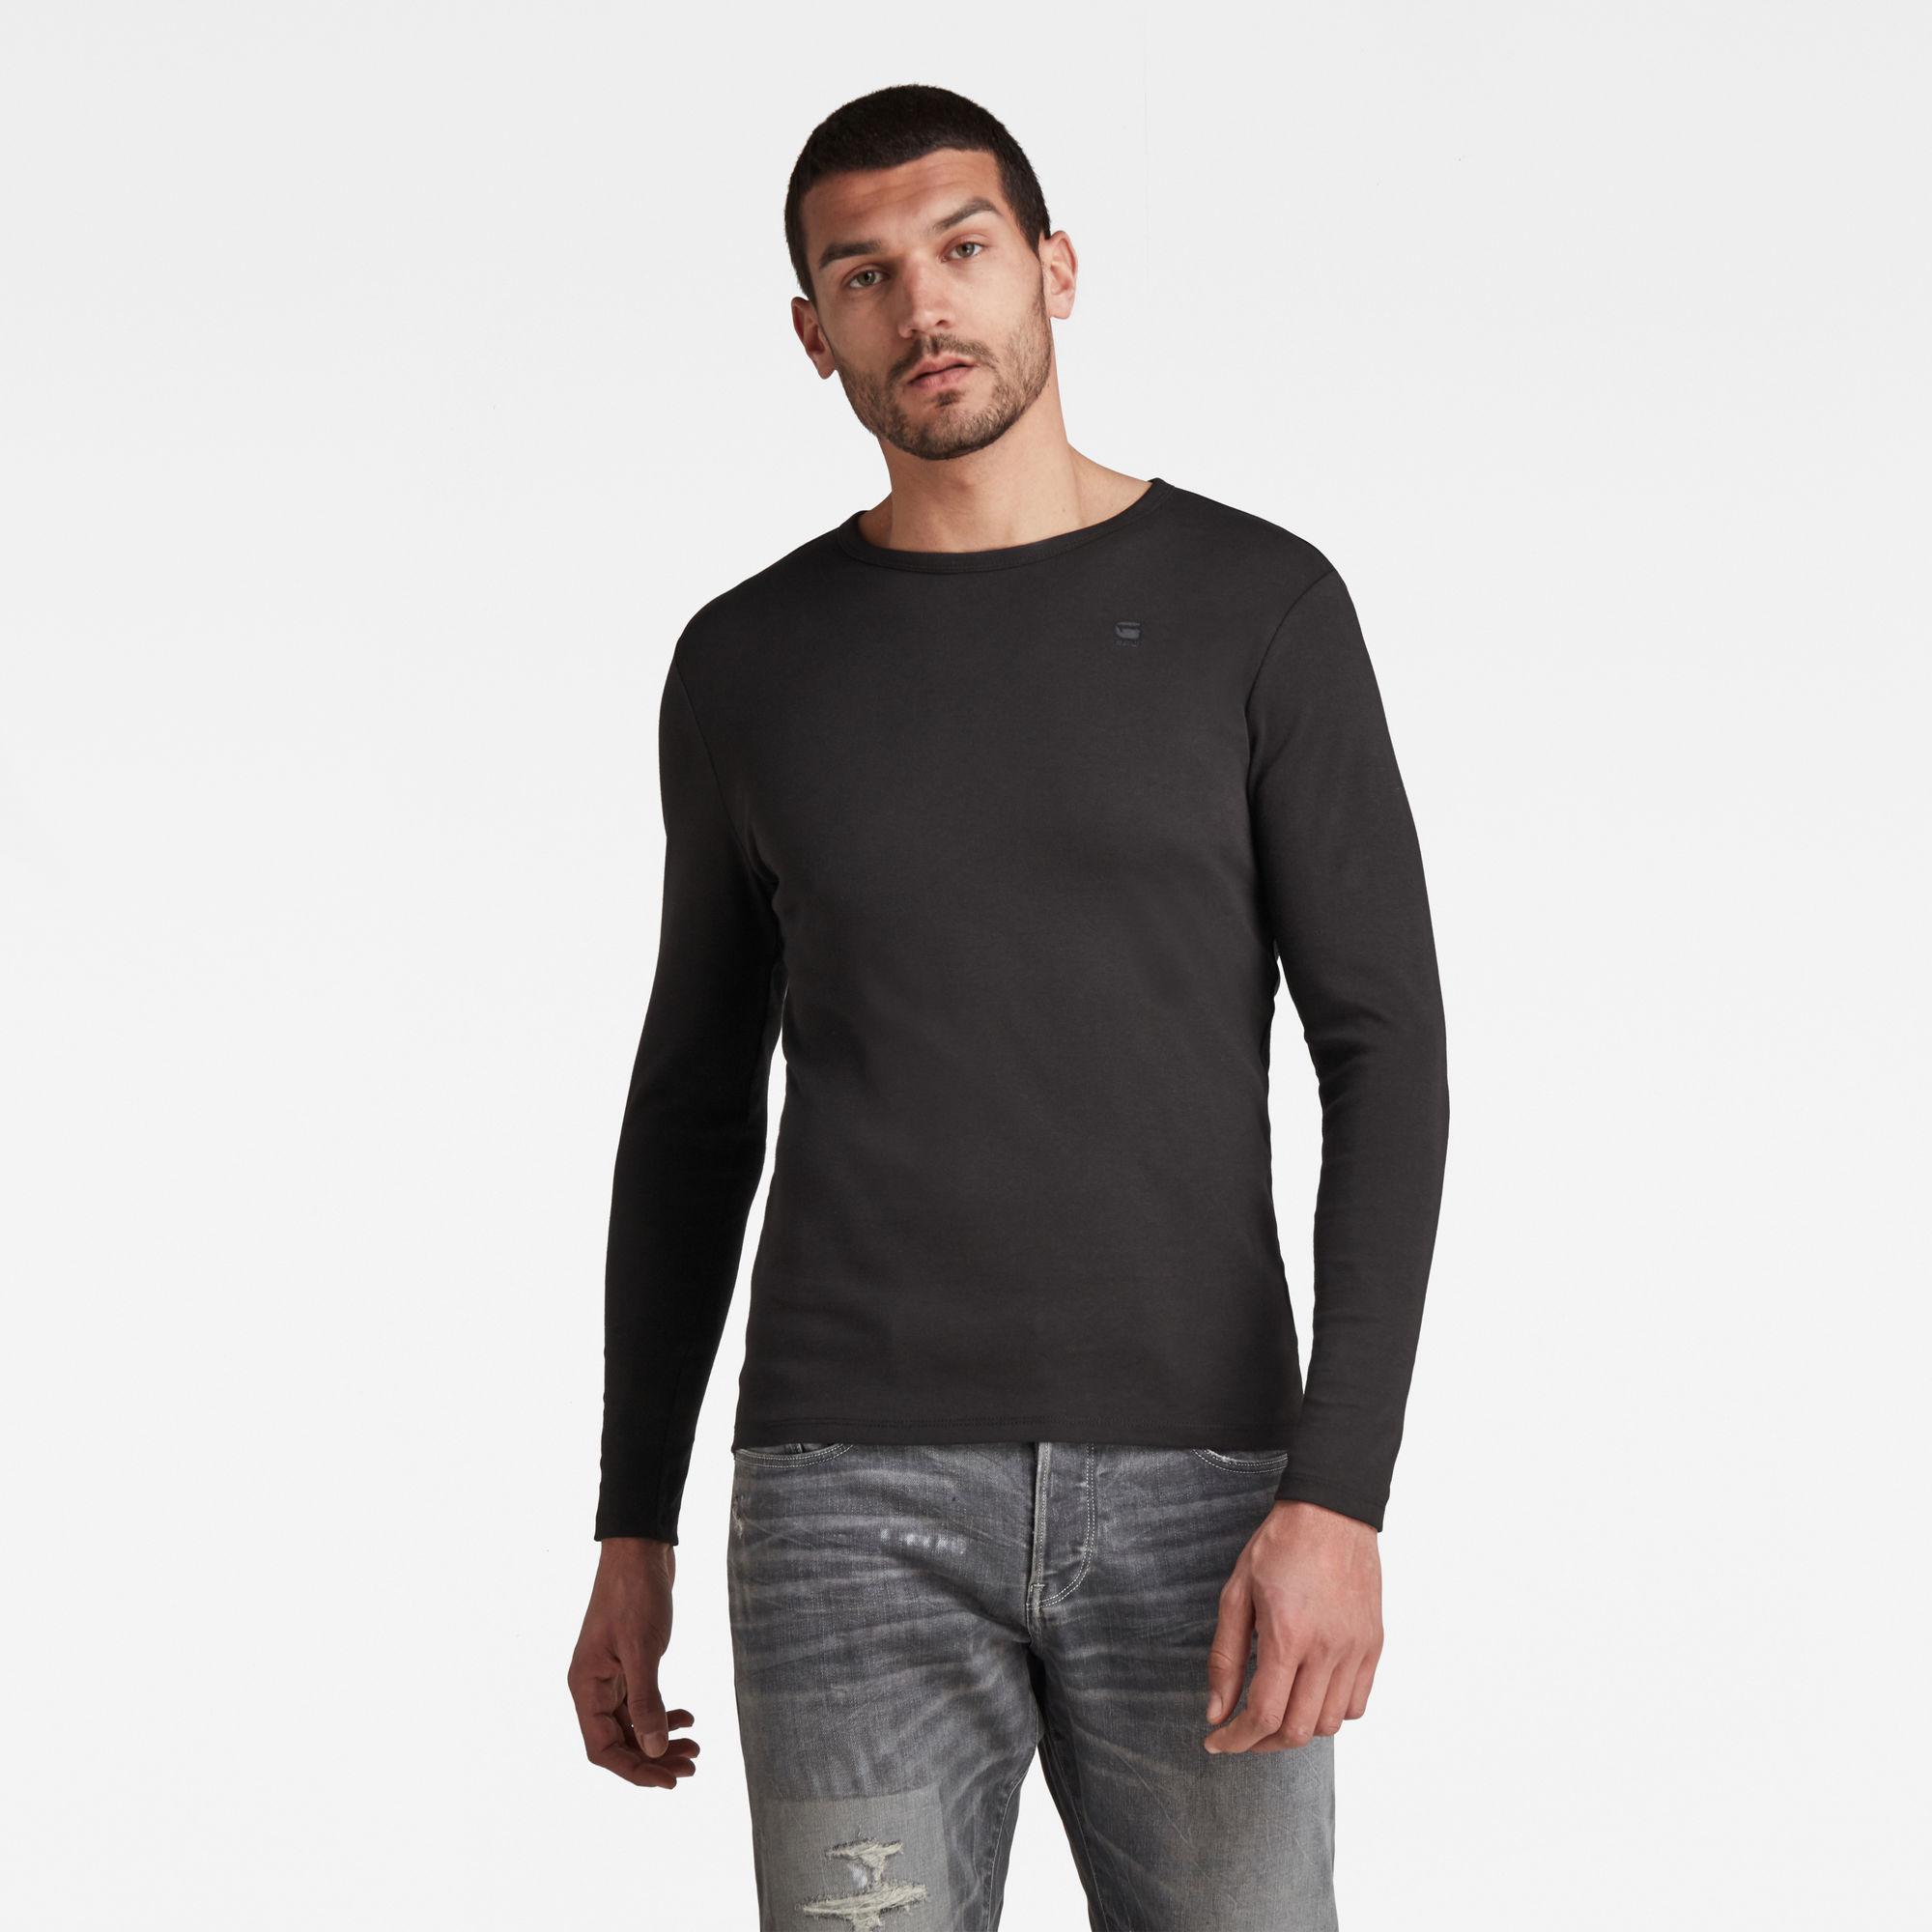 G-Star RAW Heren Basic Round Neck T-Shirt Zwart